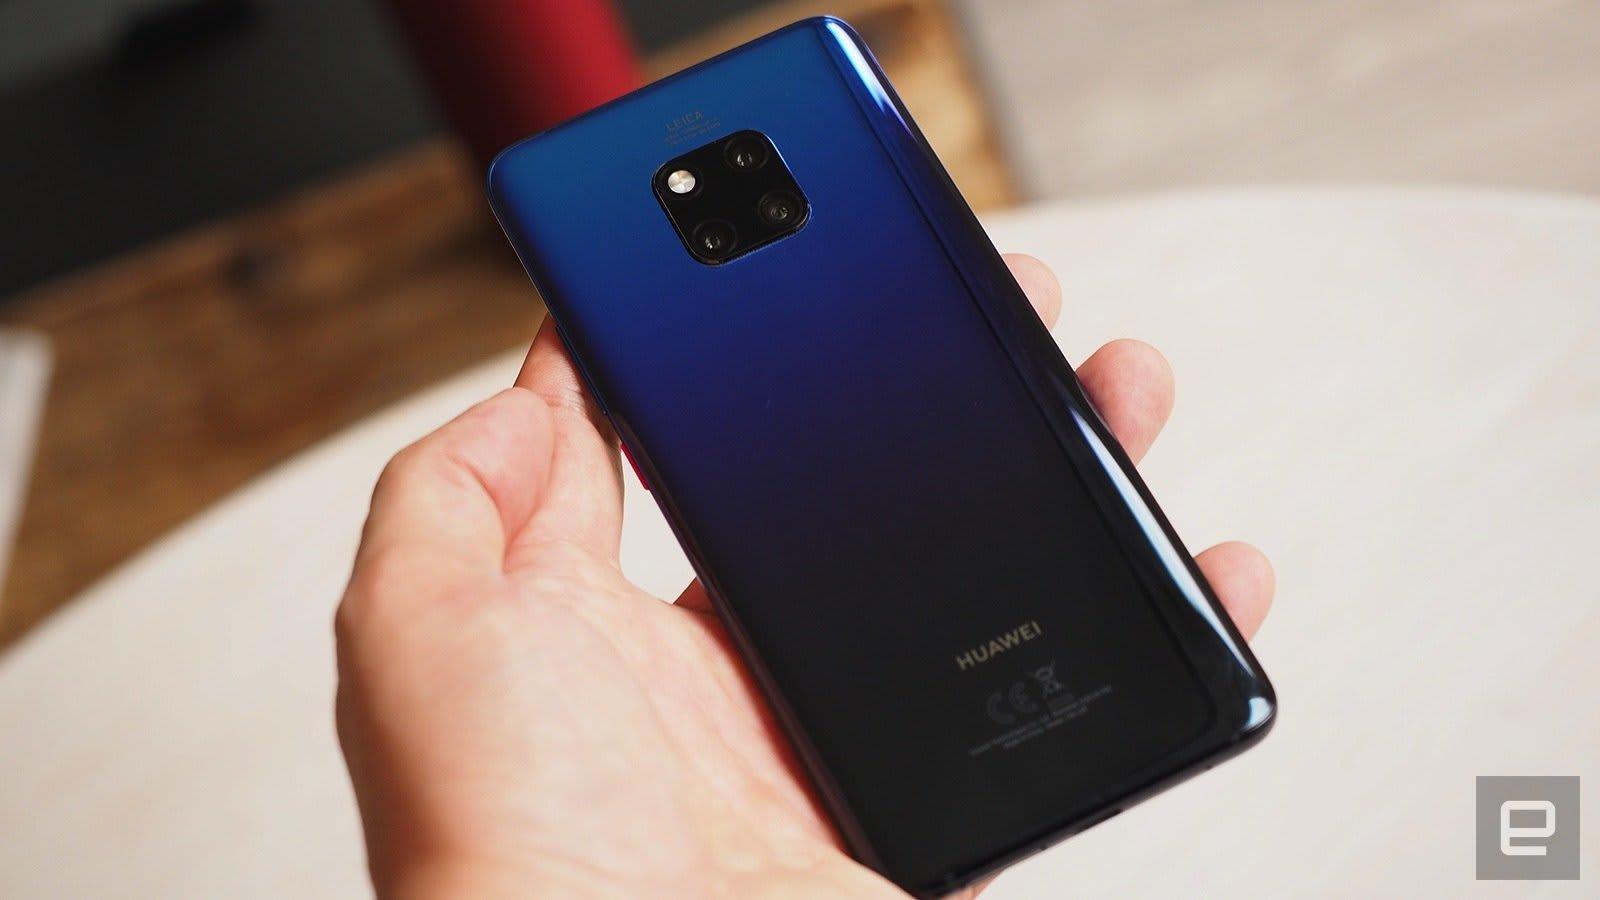 HUAWEI SmartPhone Shipment